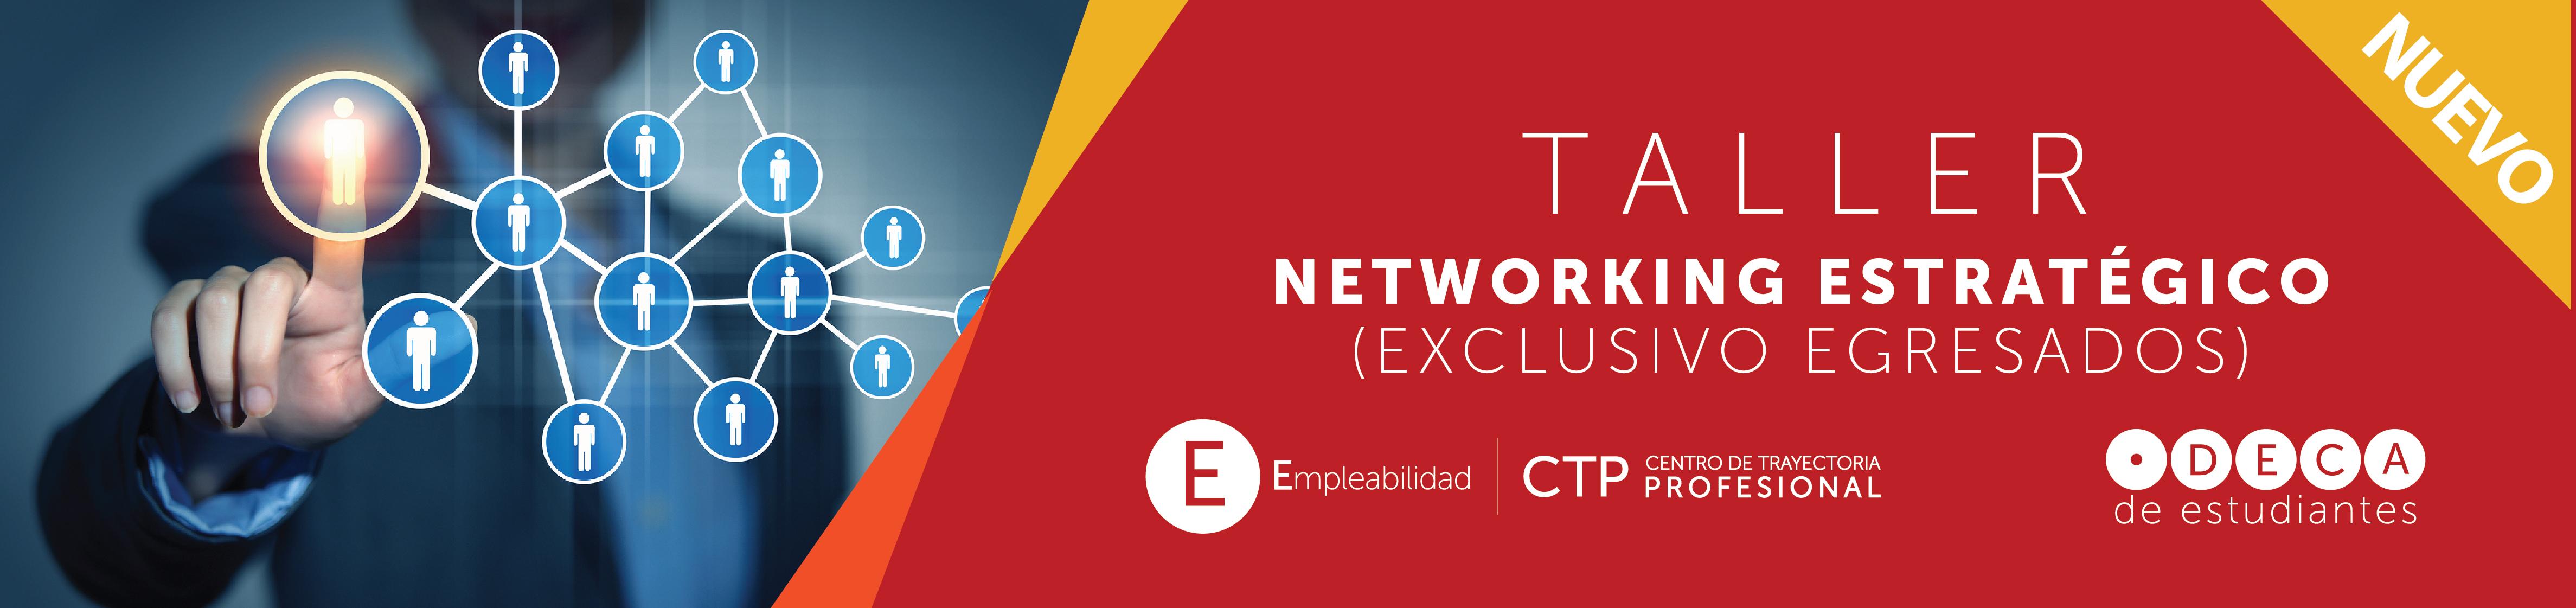 Taller_networking_estrat_gico_g.